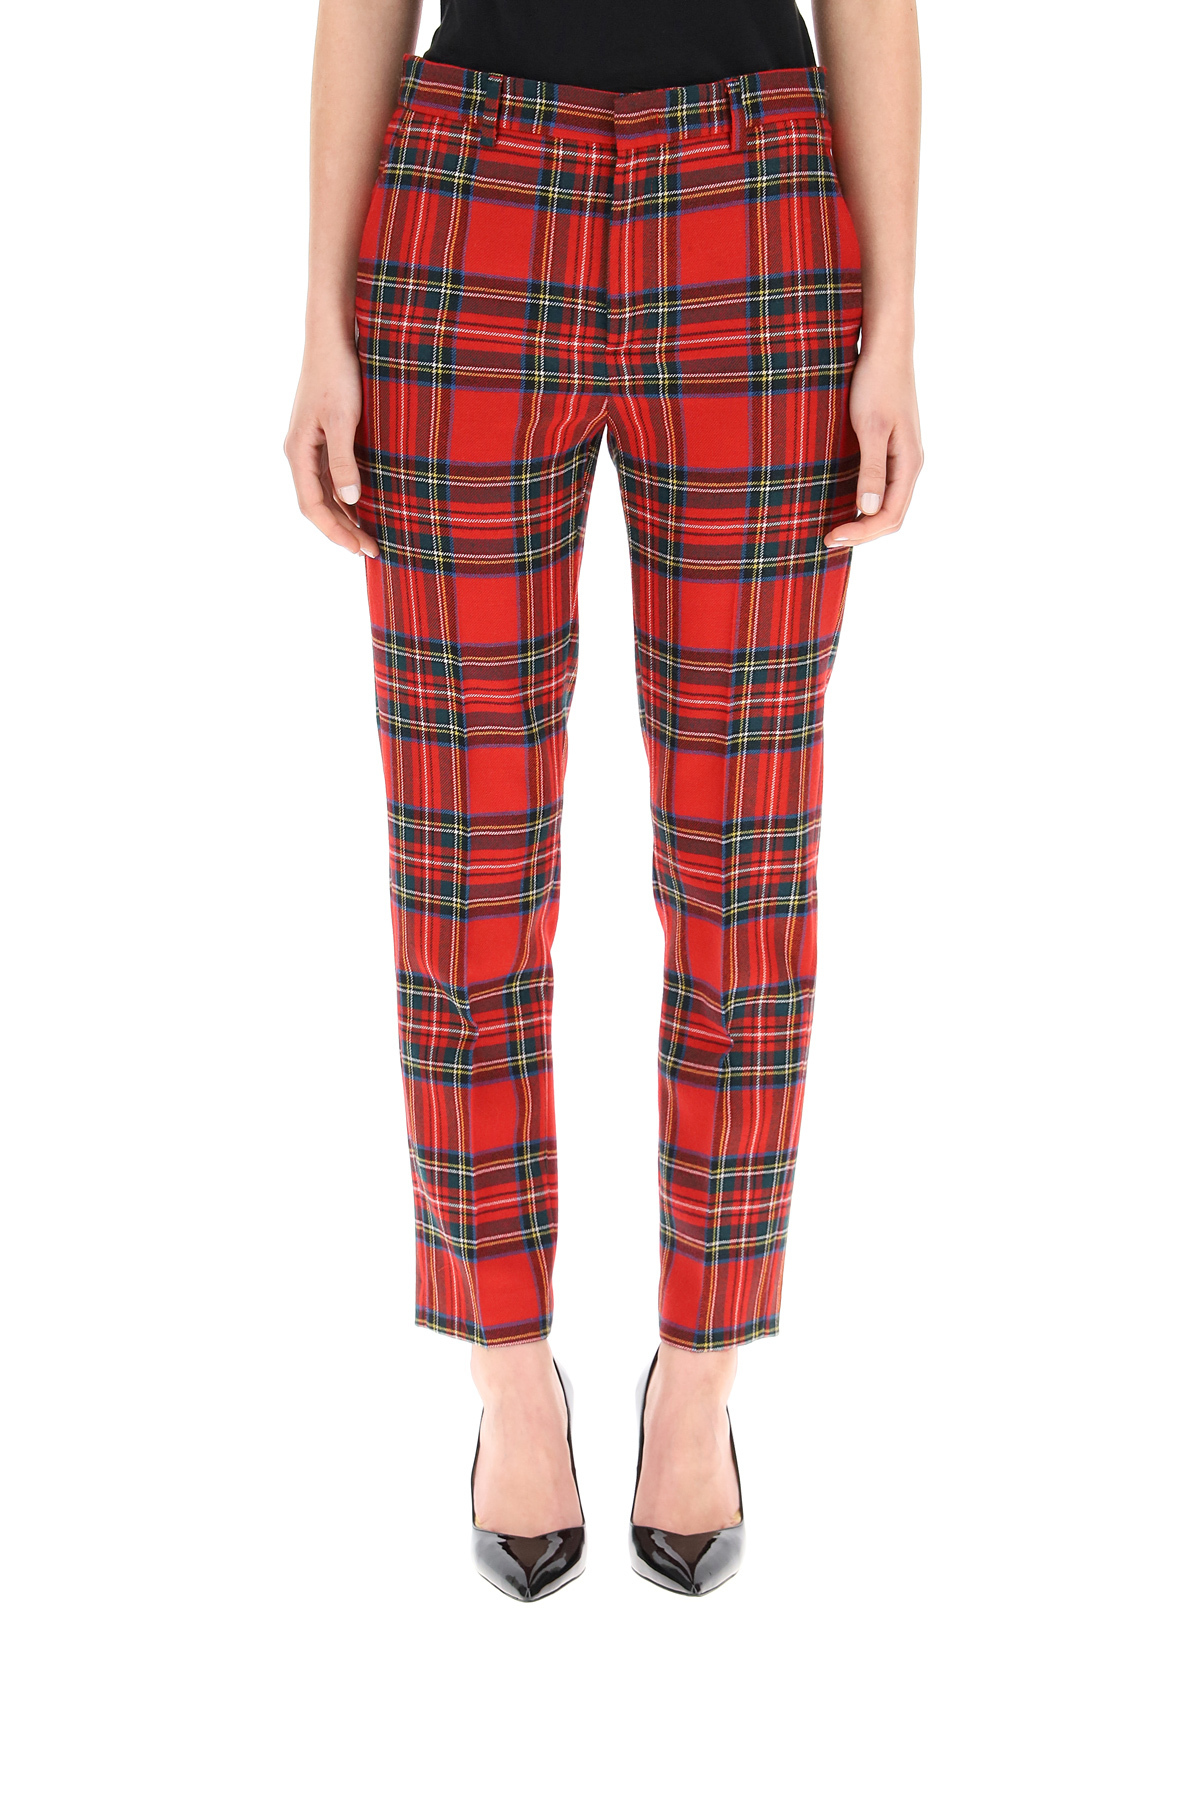 Red valentino pantalone in lana fantasia scozzese